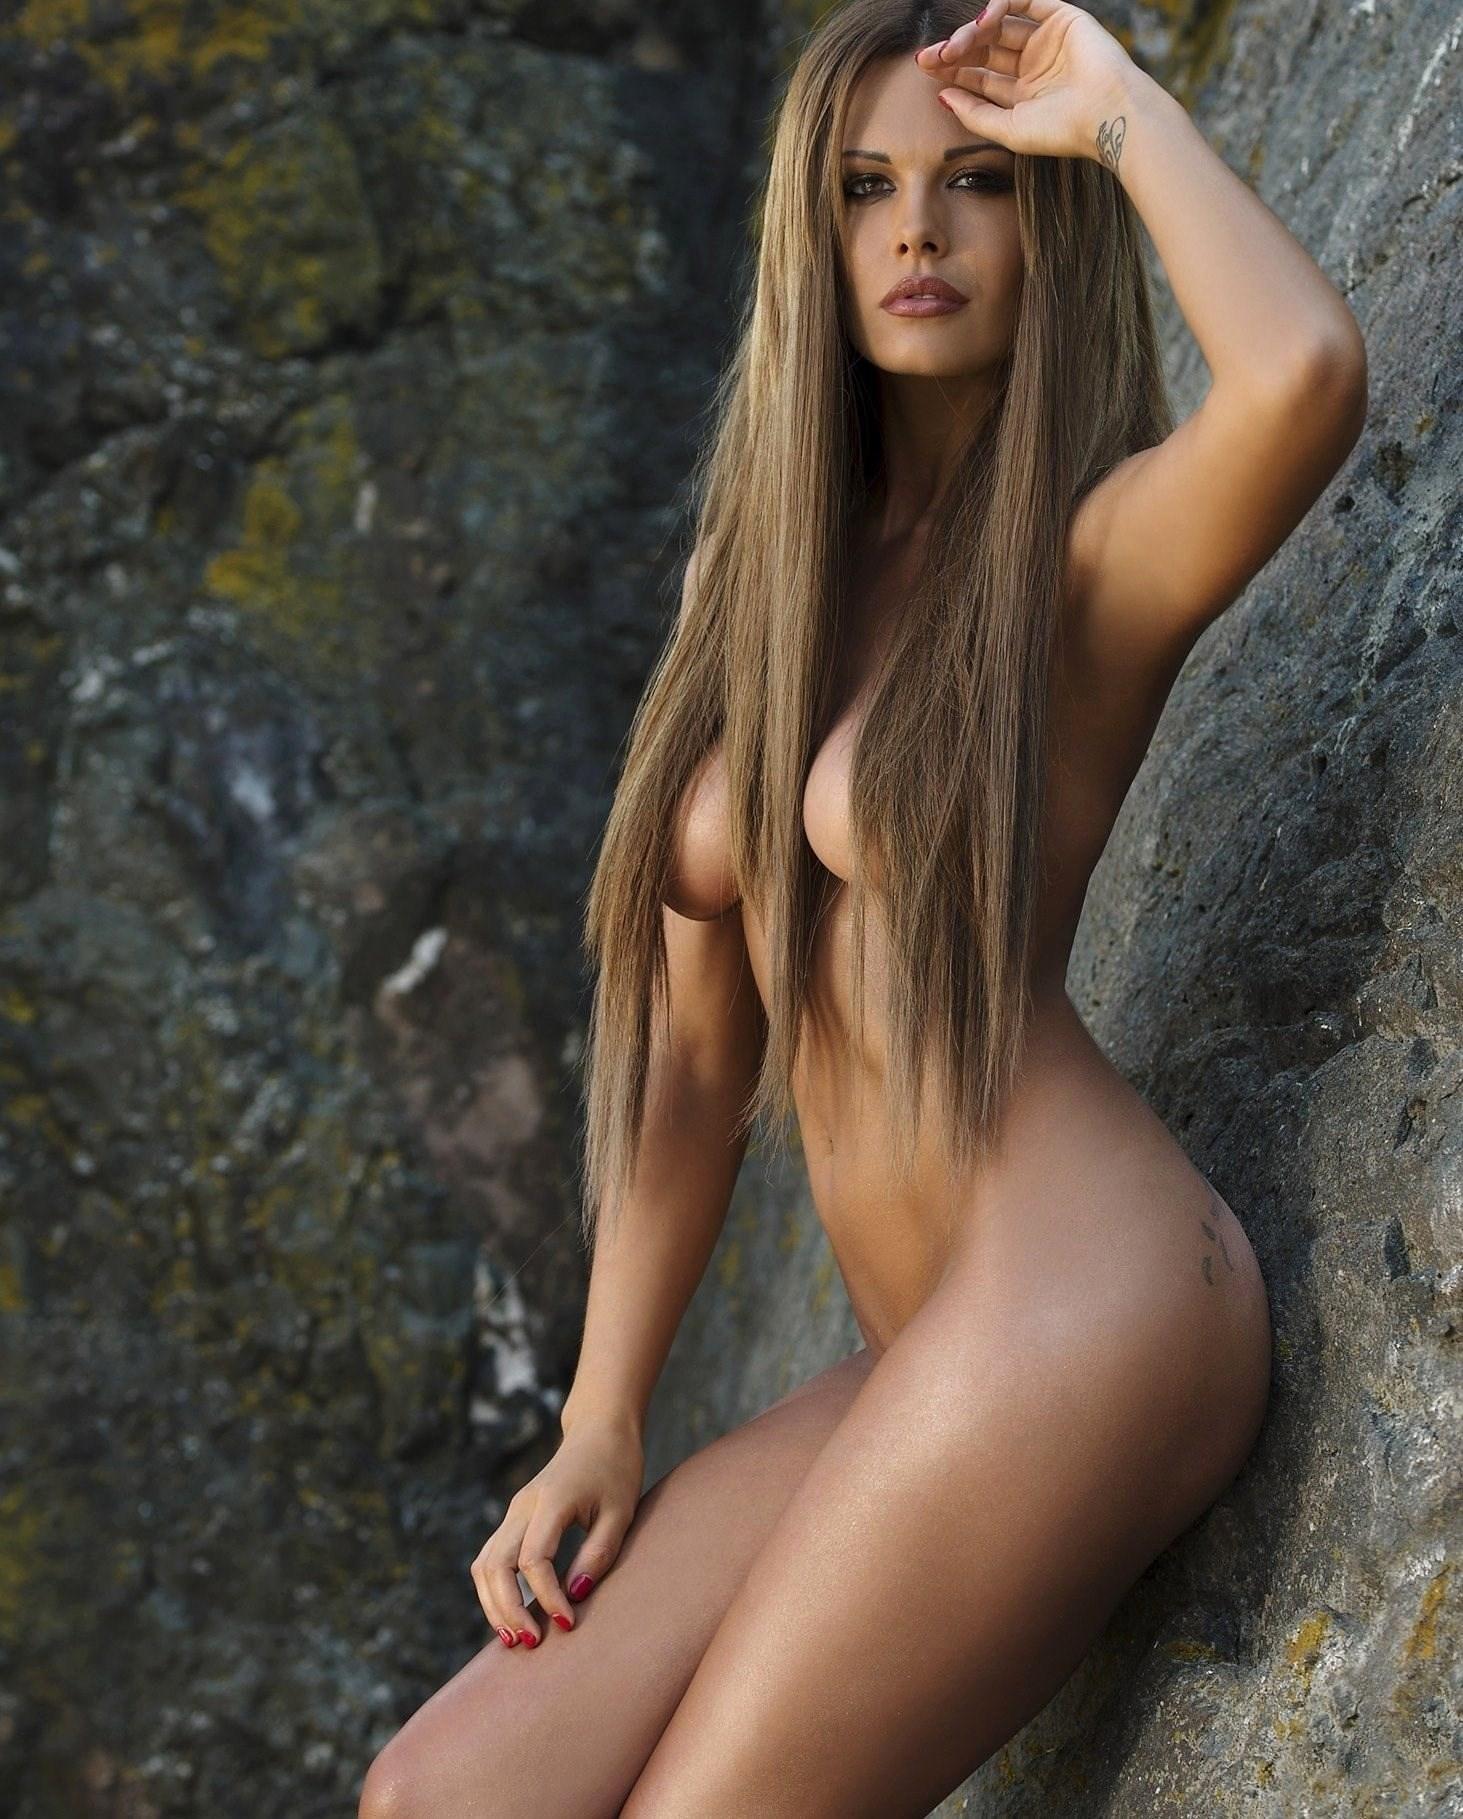 Секс фото актрис россии 13 фотография